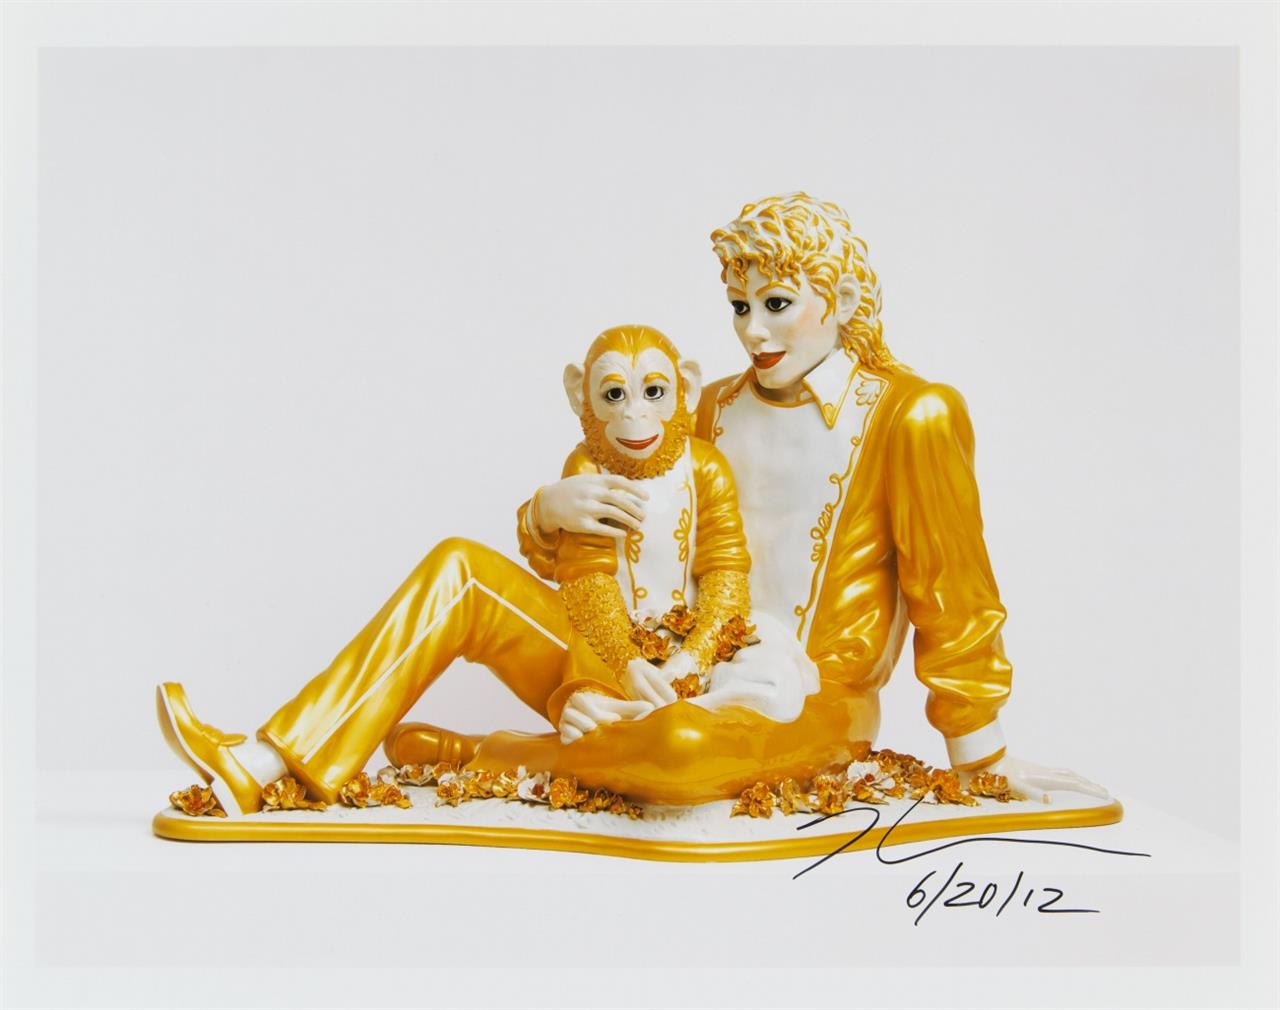 Jeff Koons. Michael Jackson und Bubbles. 2012. C-Print. Signiert.